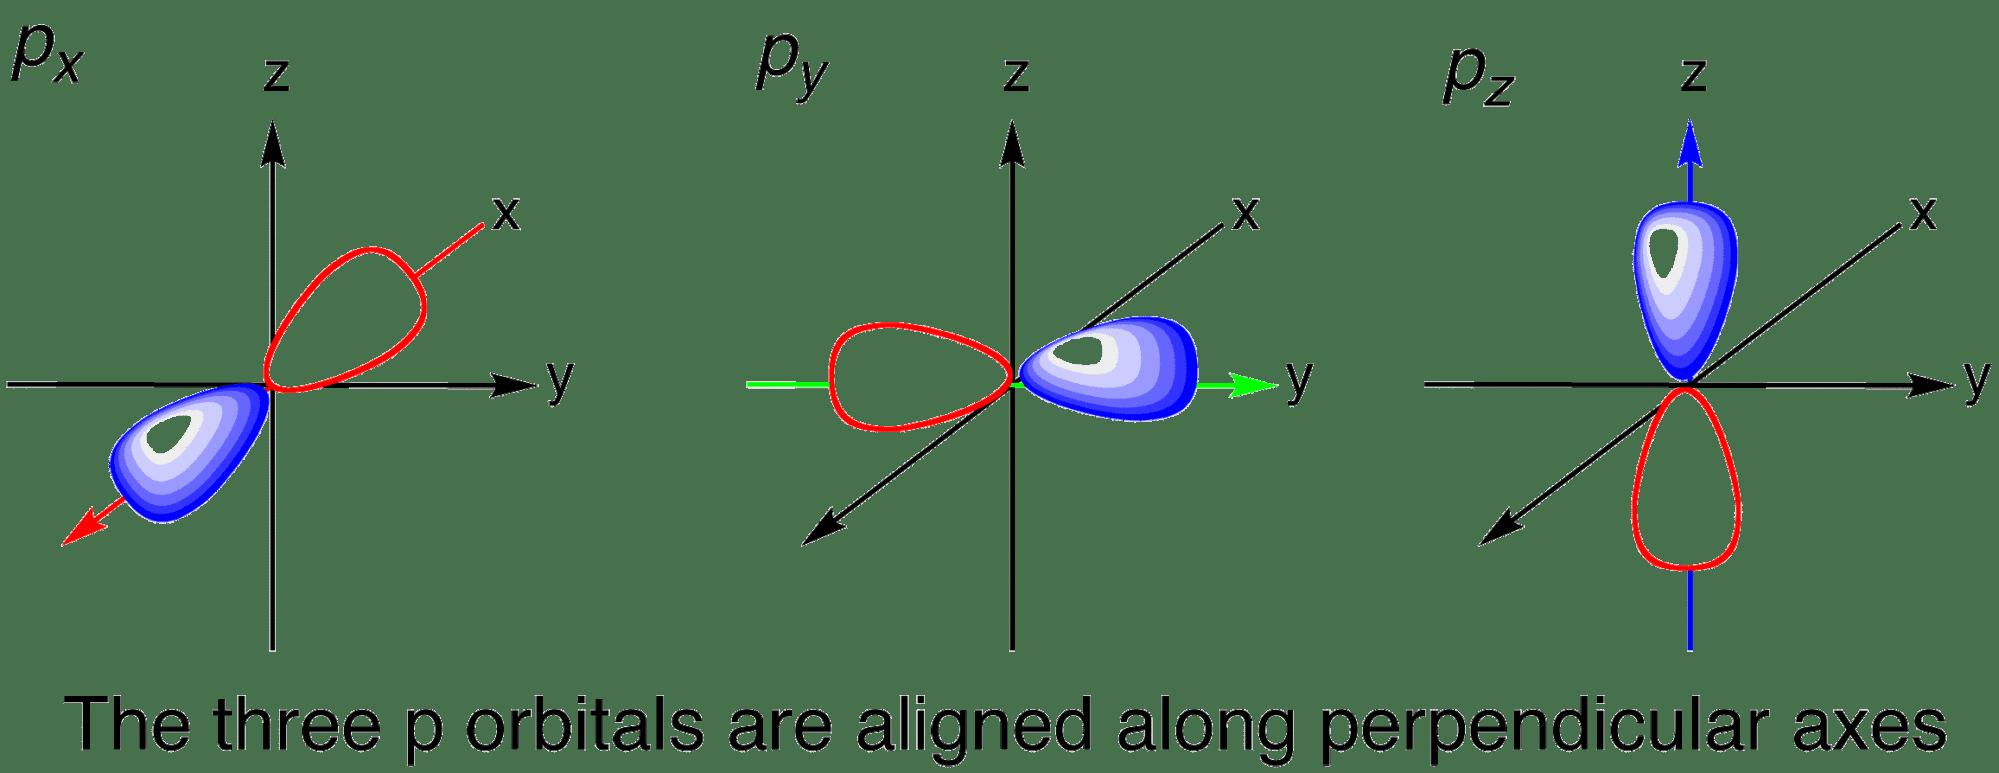 hight resolution of 3 p orbitals